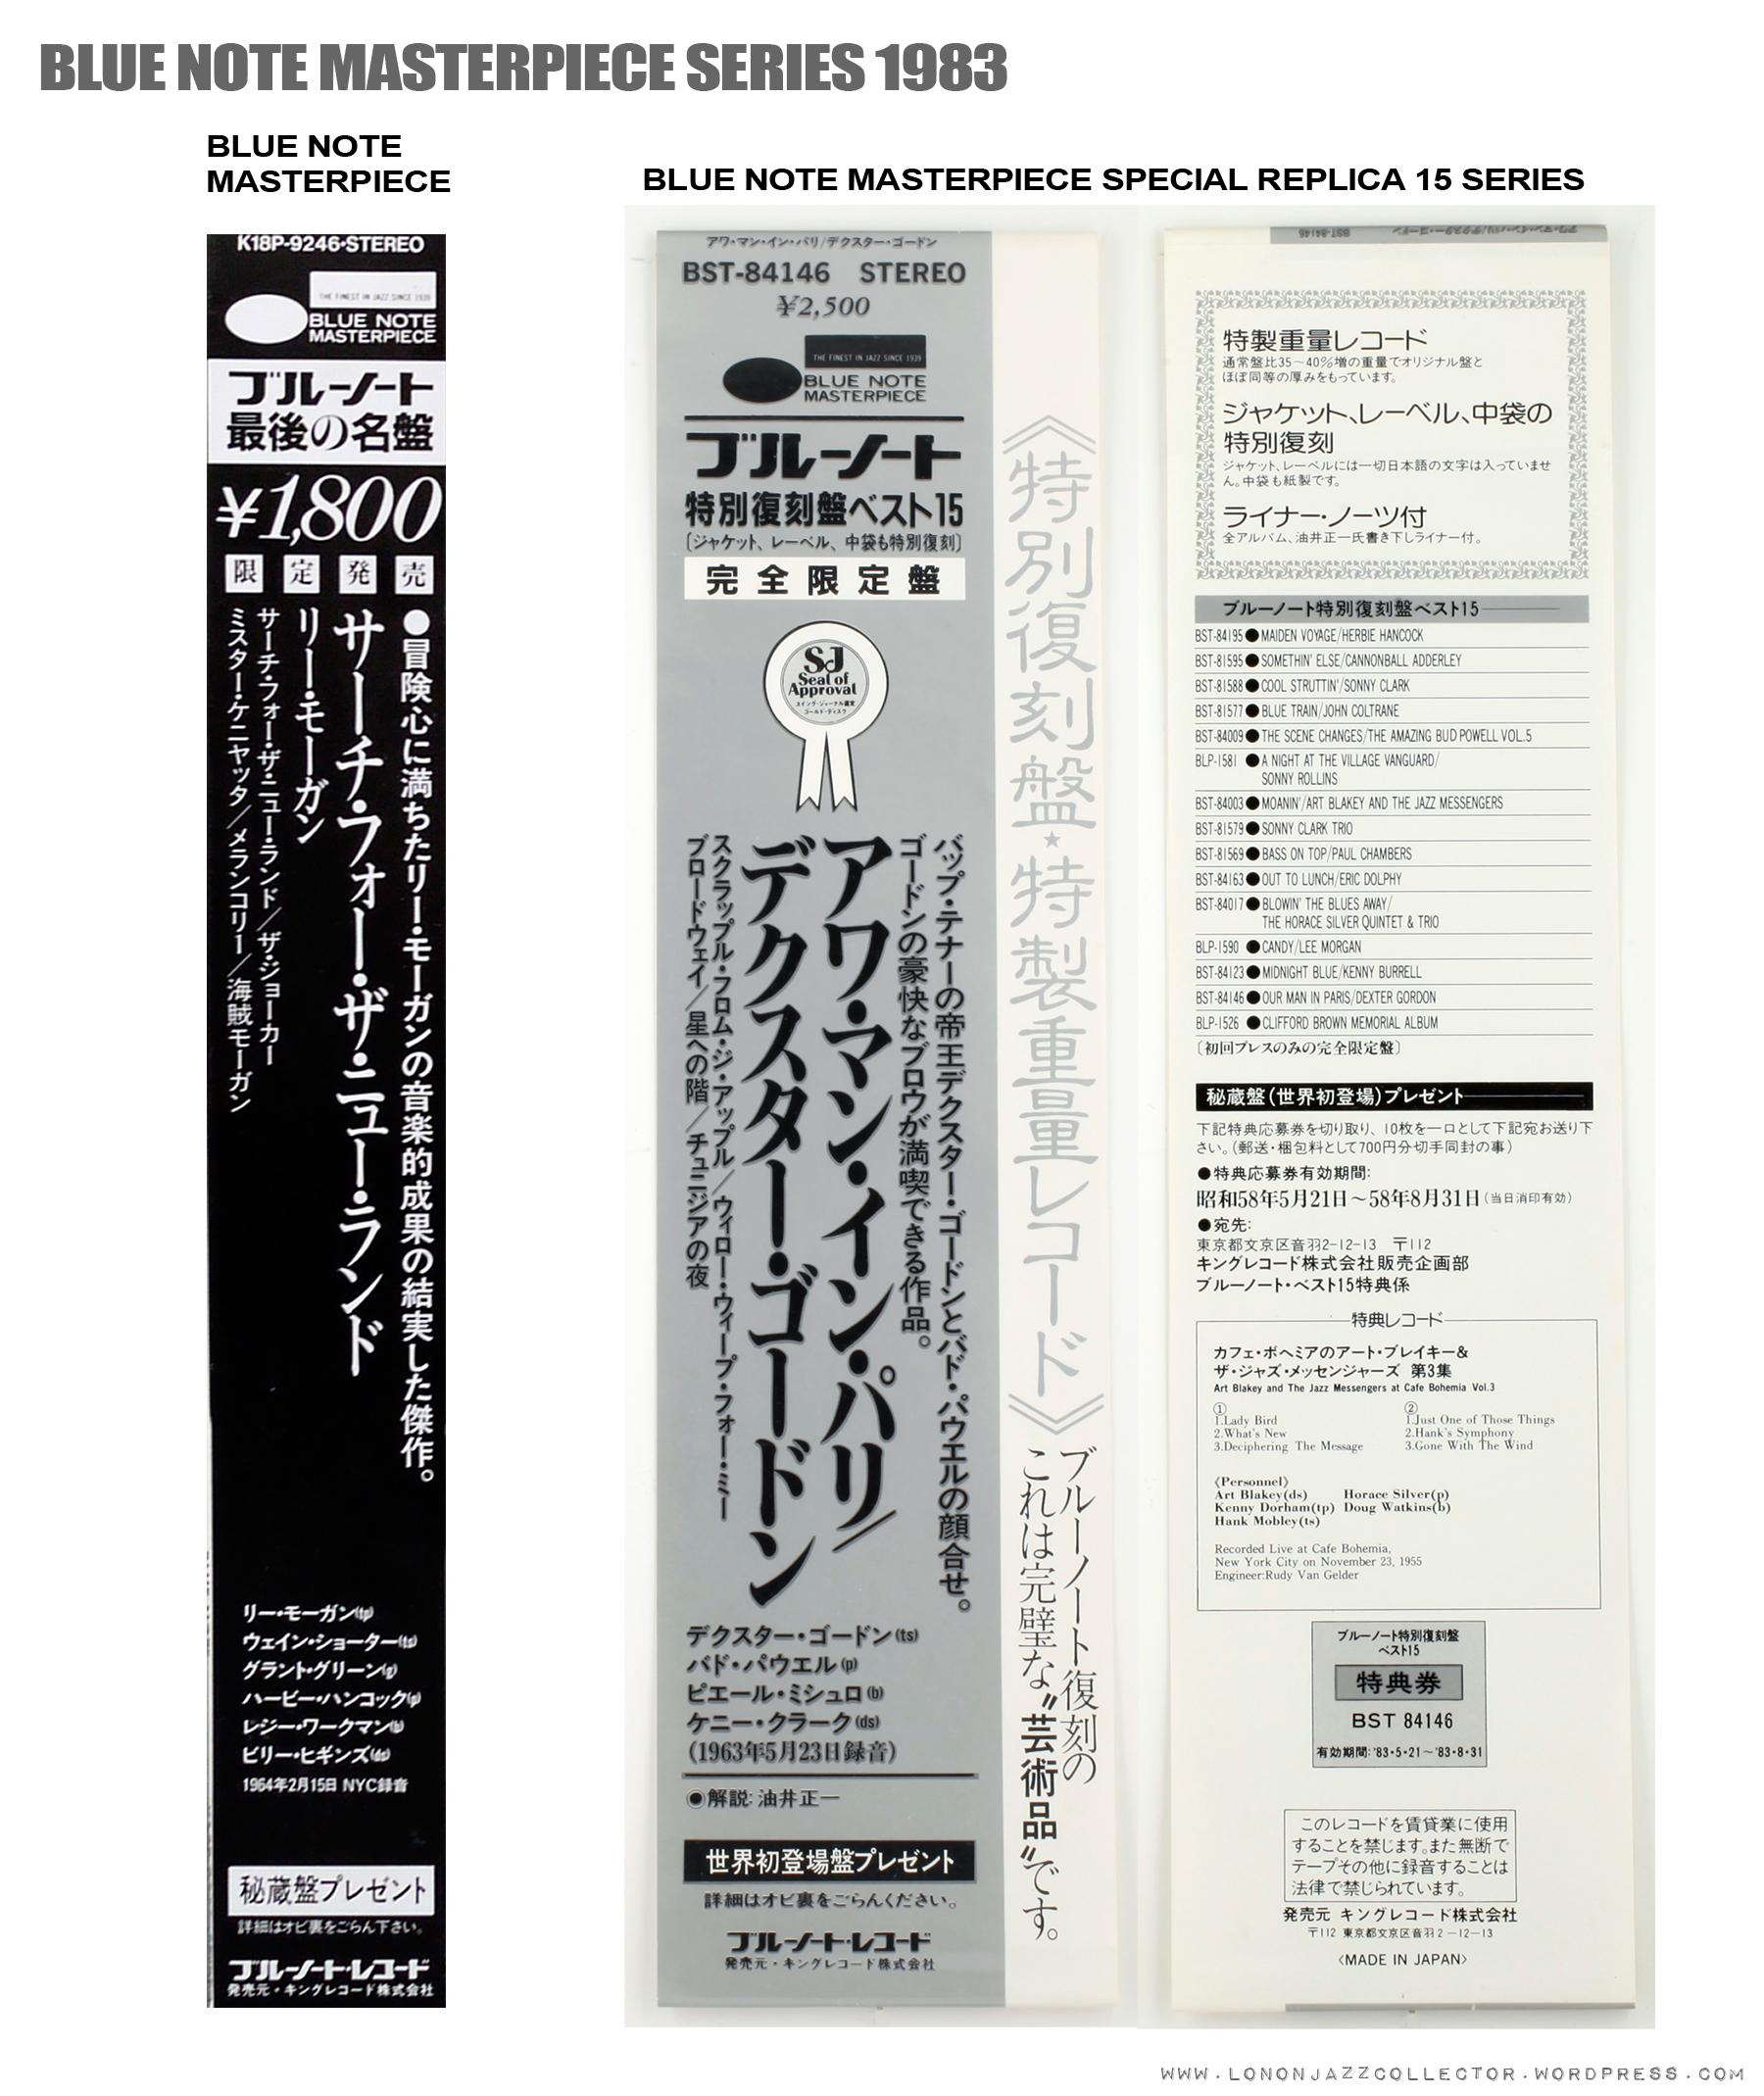 King-OBI-Masterpiece-15-Replica-Series